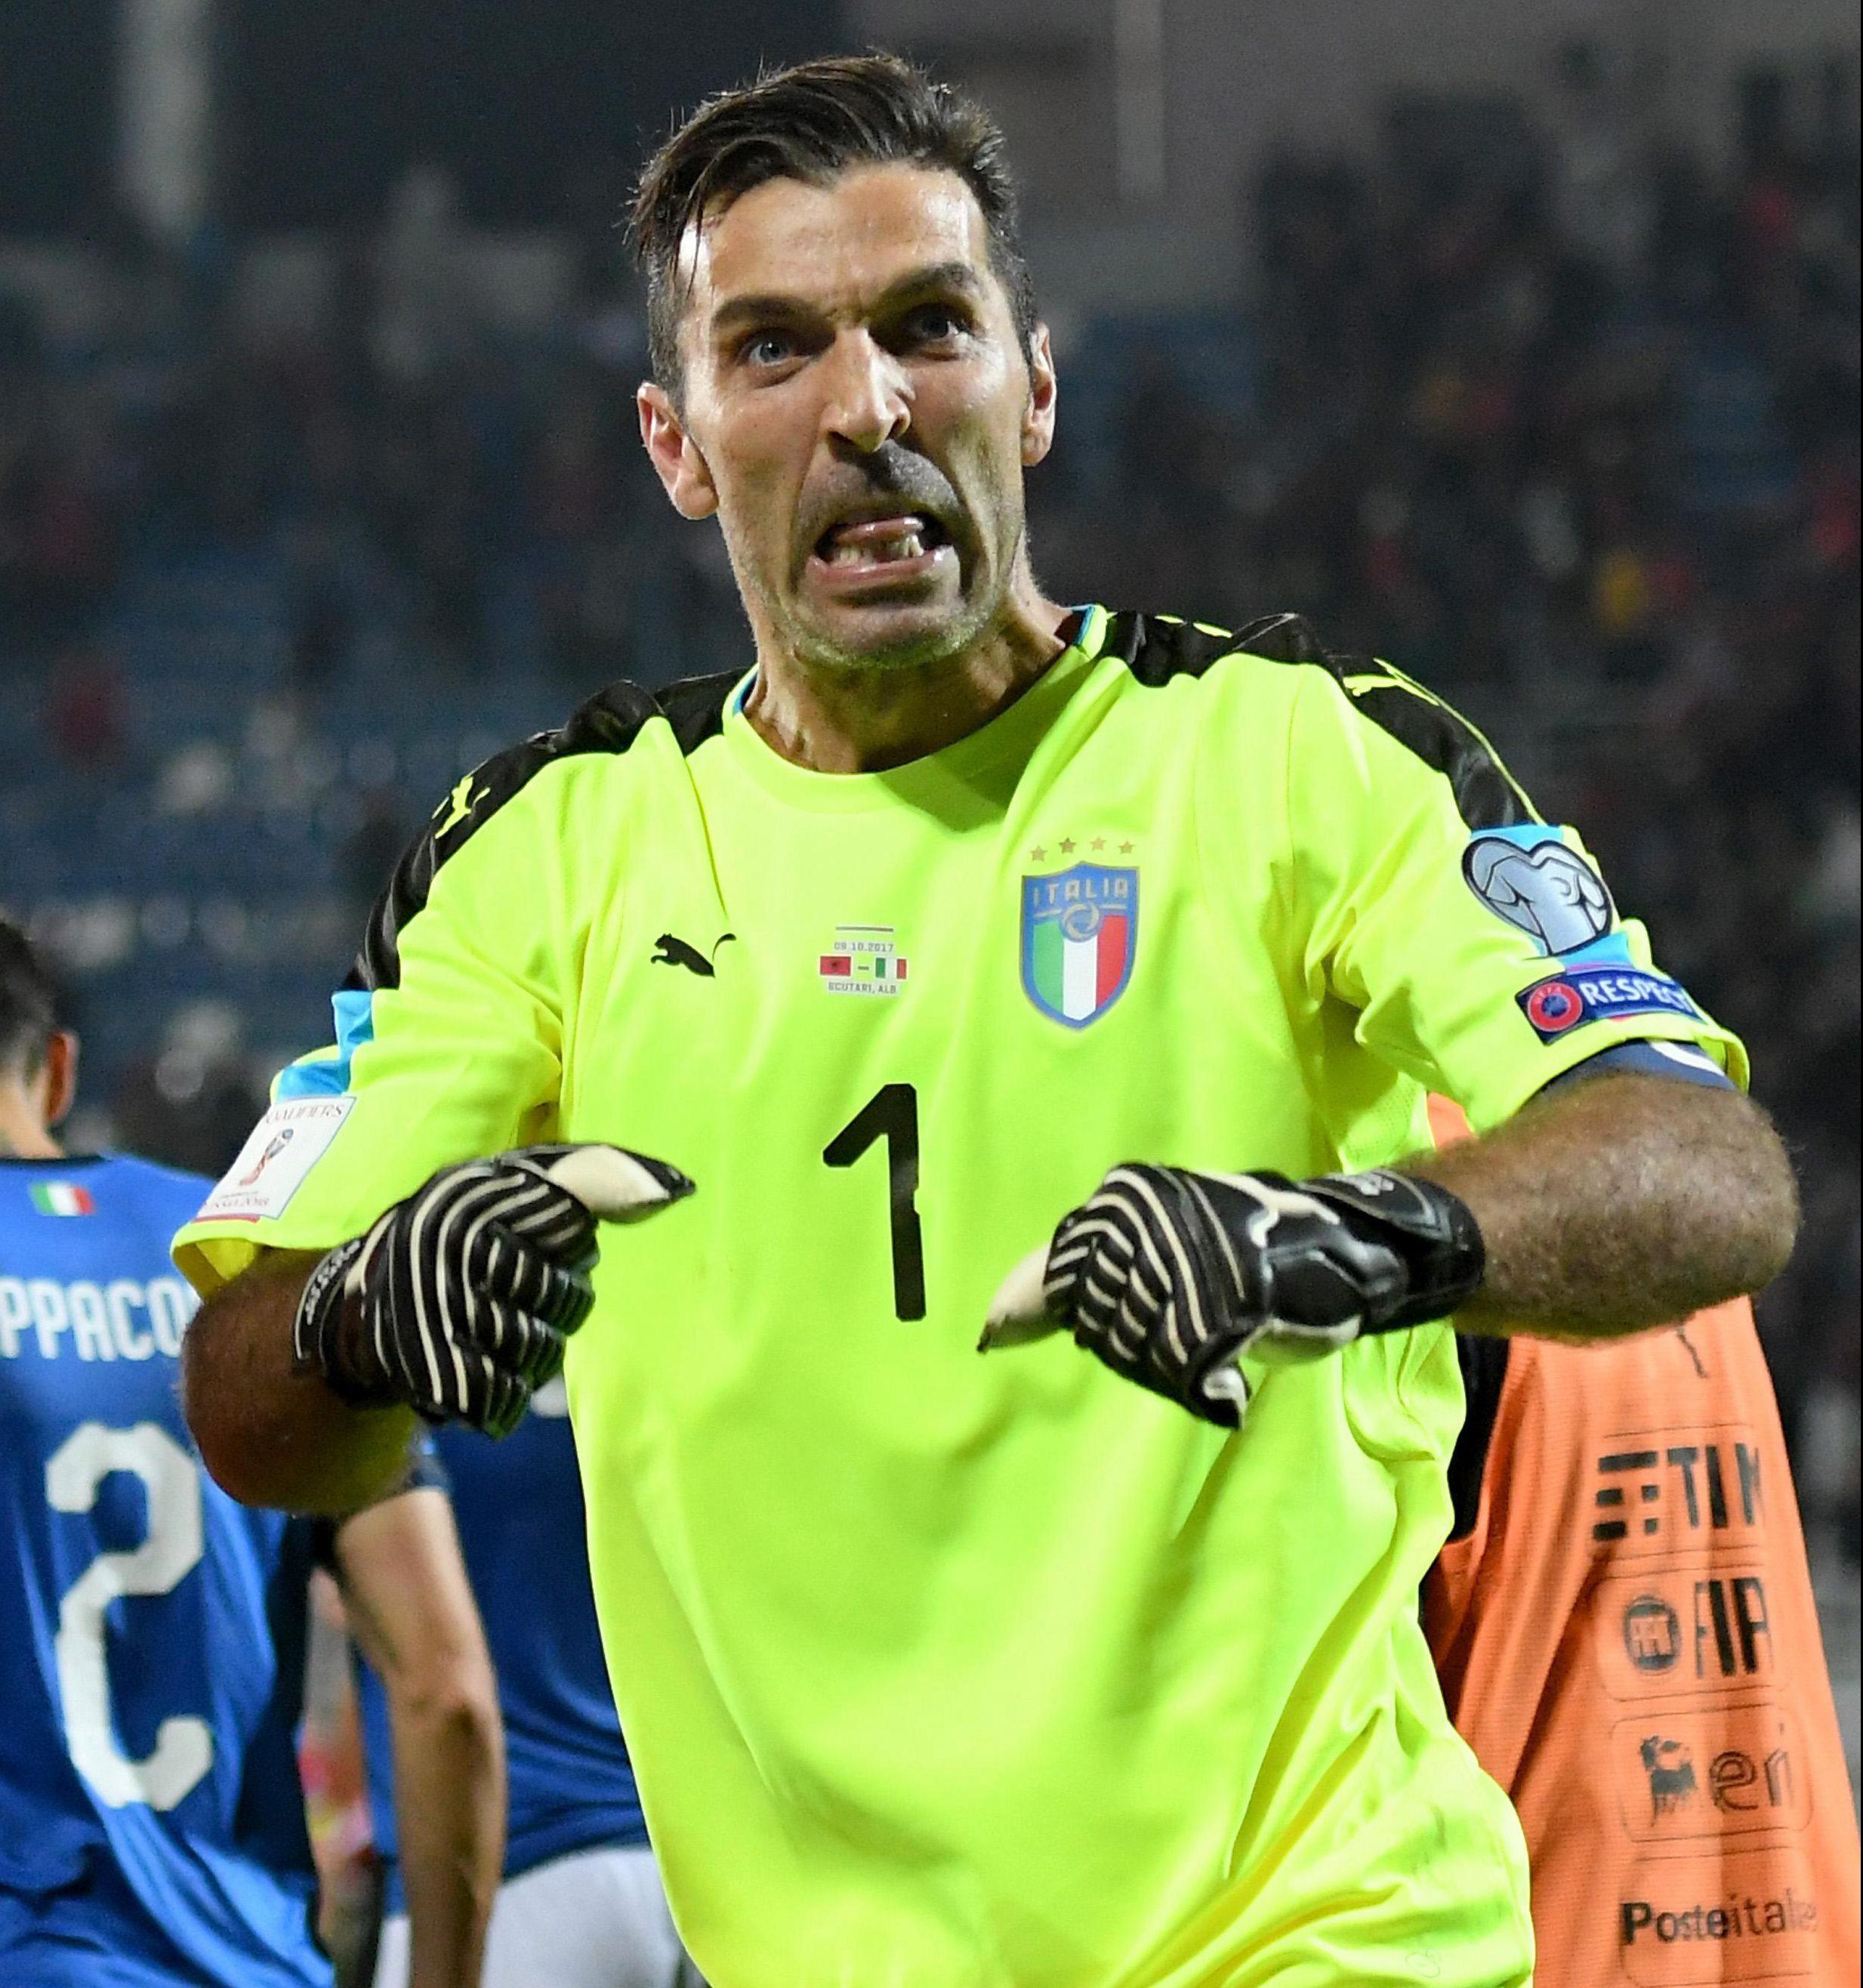 Buffon has racked up a mega 173 caps for the Azzurri